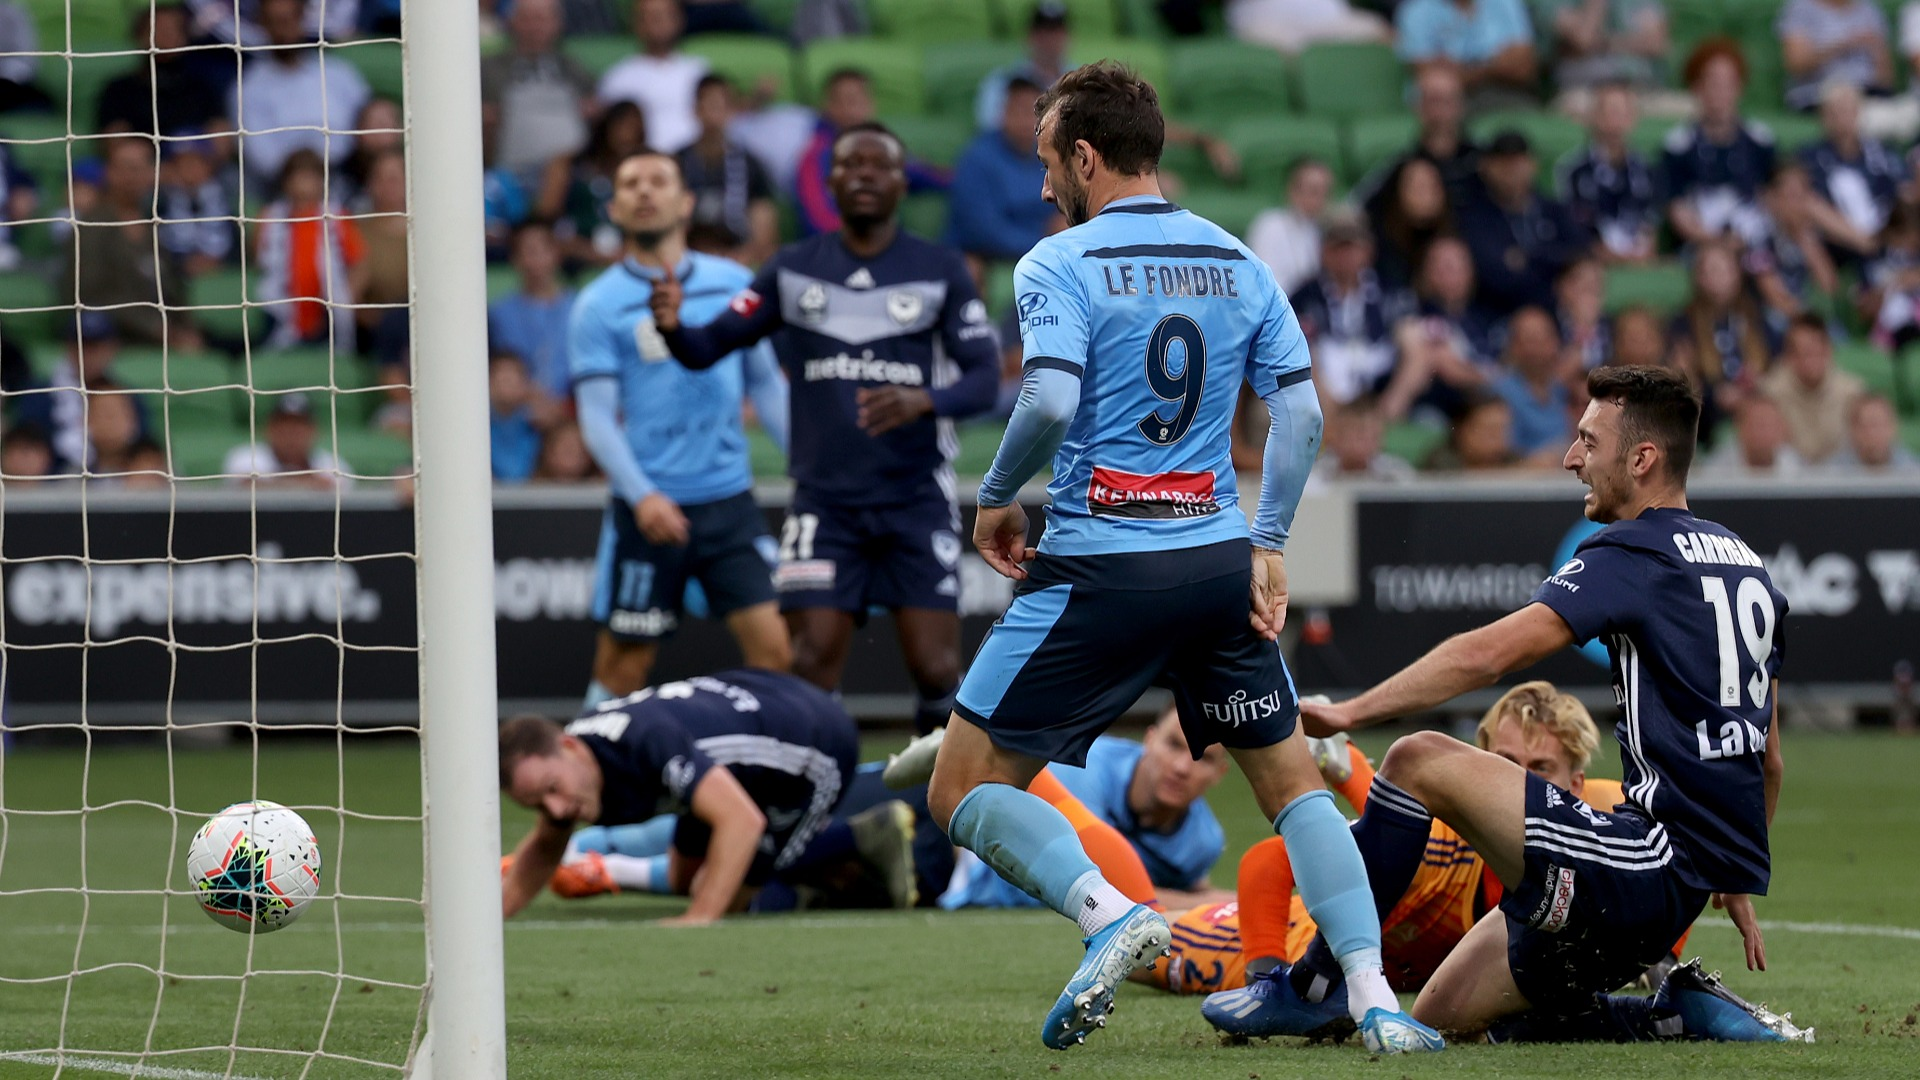 A-League: Le Fondre on target as leaders Sydney win again